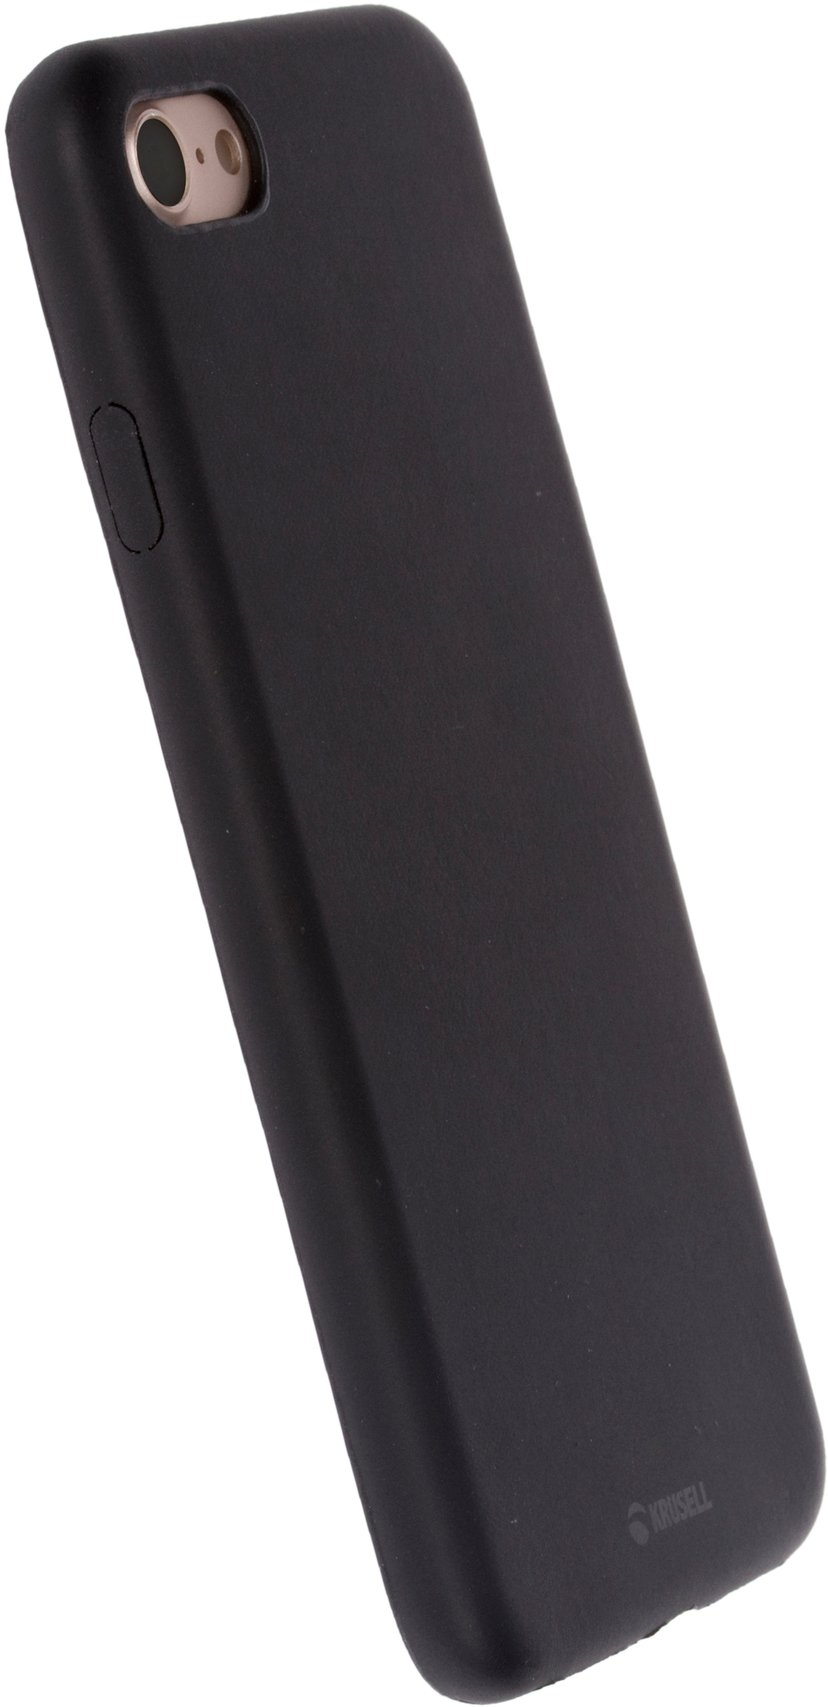 Krusell Bellö baksidedeksel for mobiltelefon iPhone 7; iPhone 8 Svart